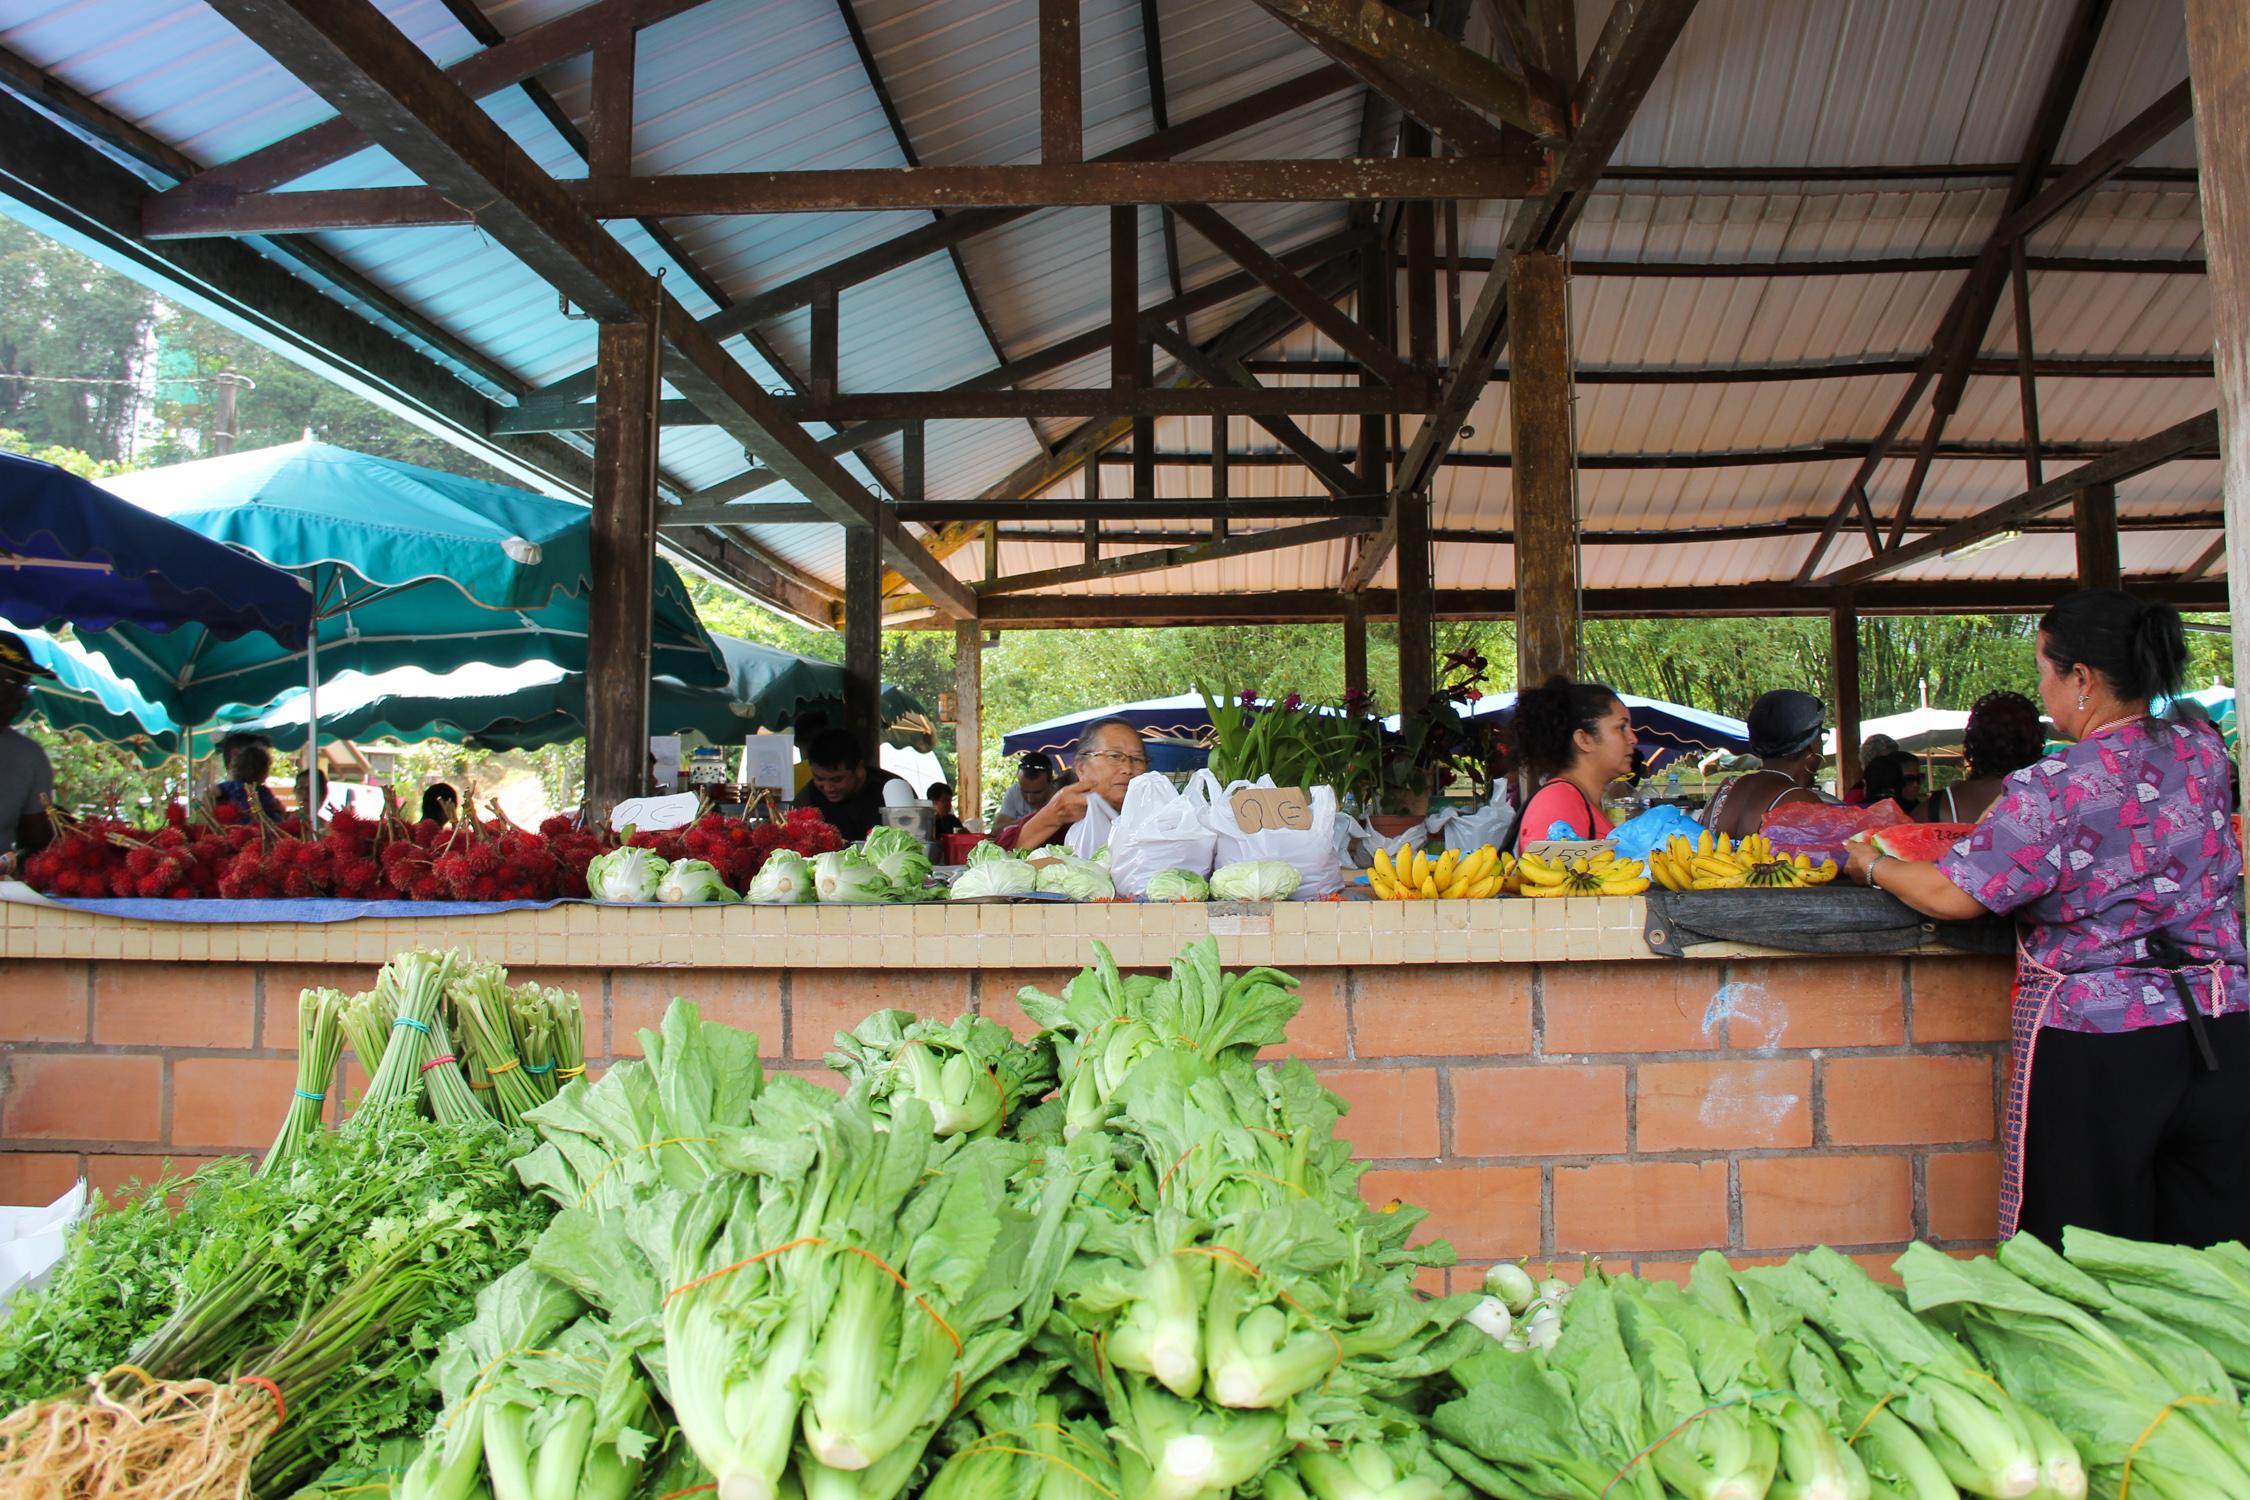 GUYANE - marché Hmong de Cacao